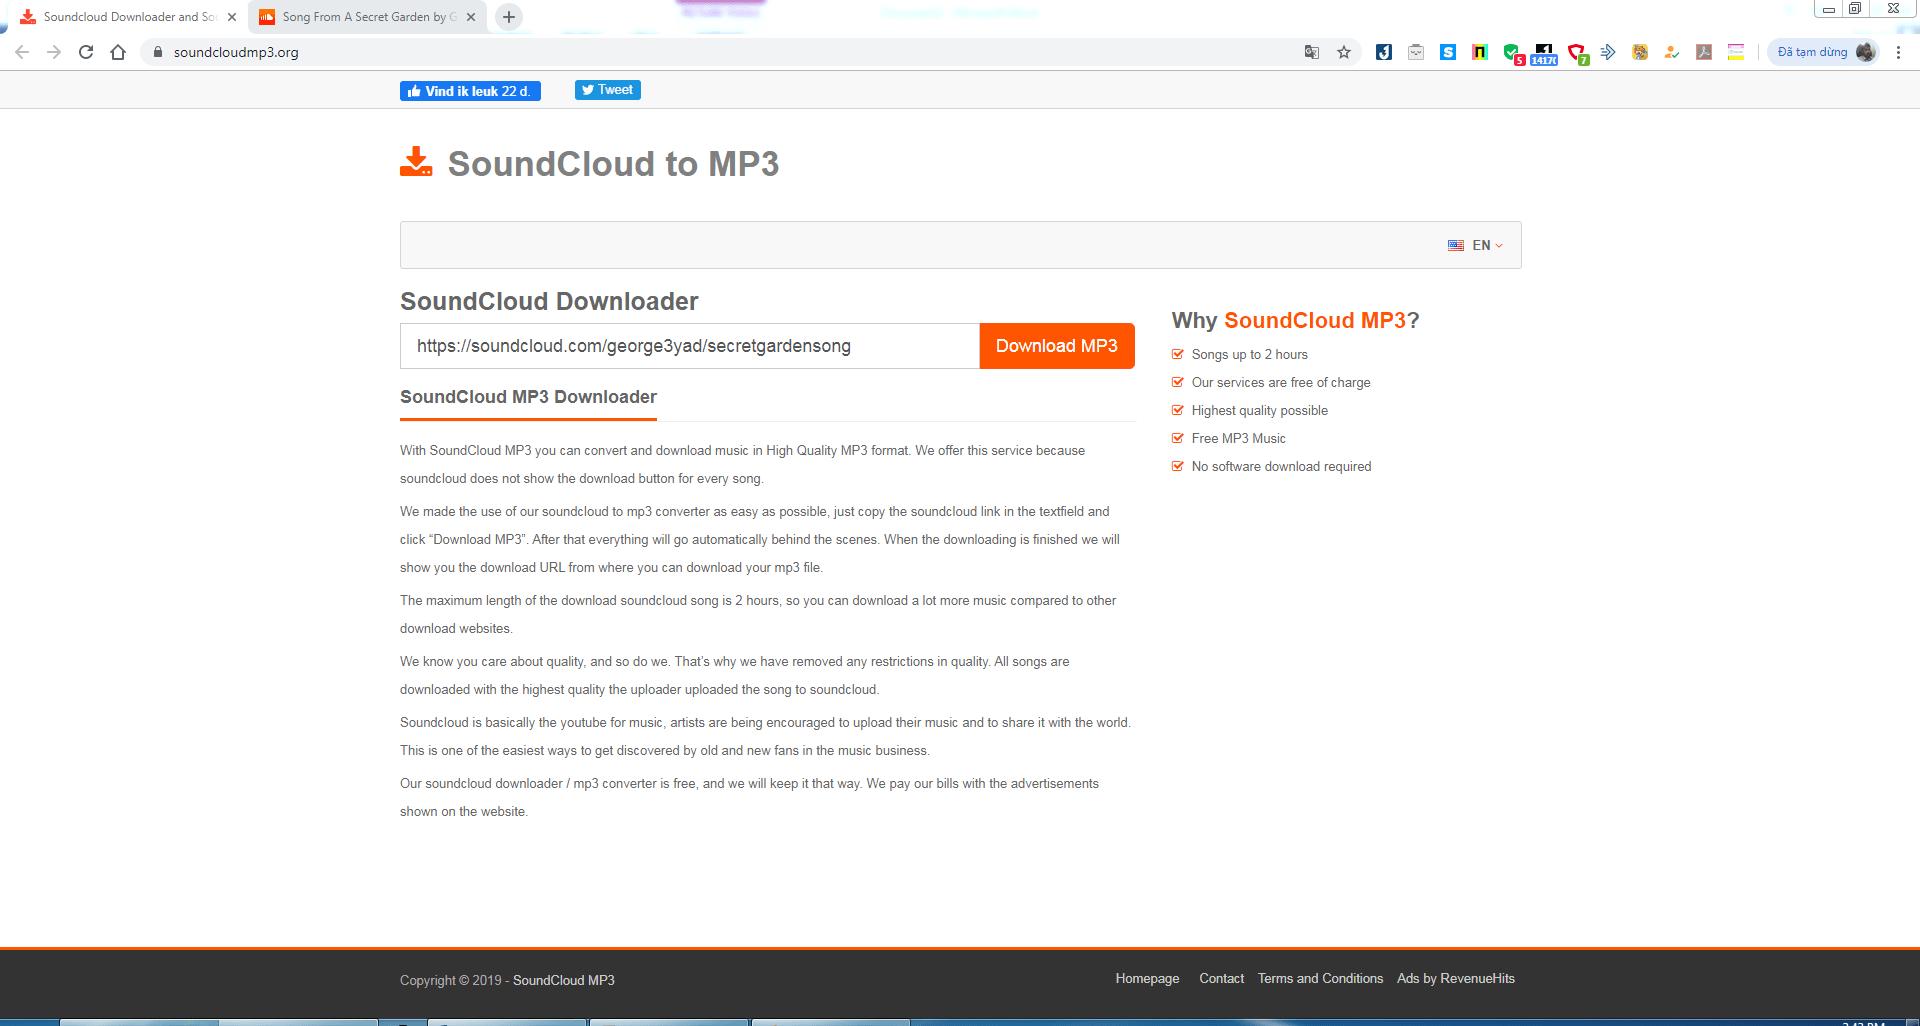 huong-dan-dung-may-tinh-tai-nhac-tren-soundcloud-1